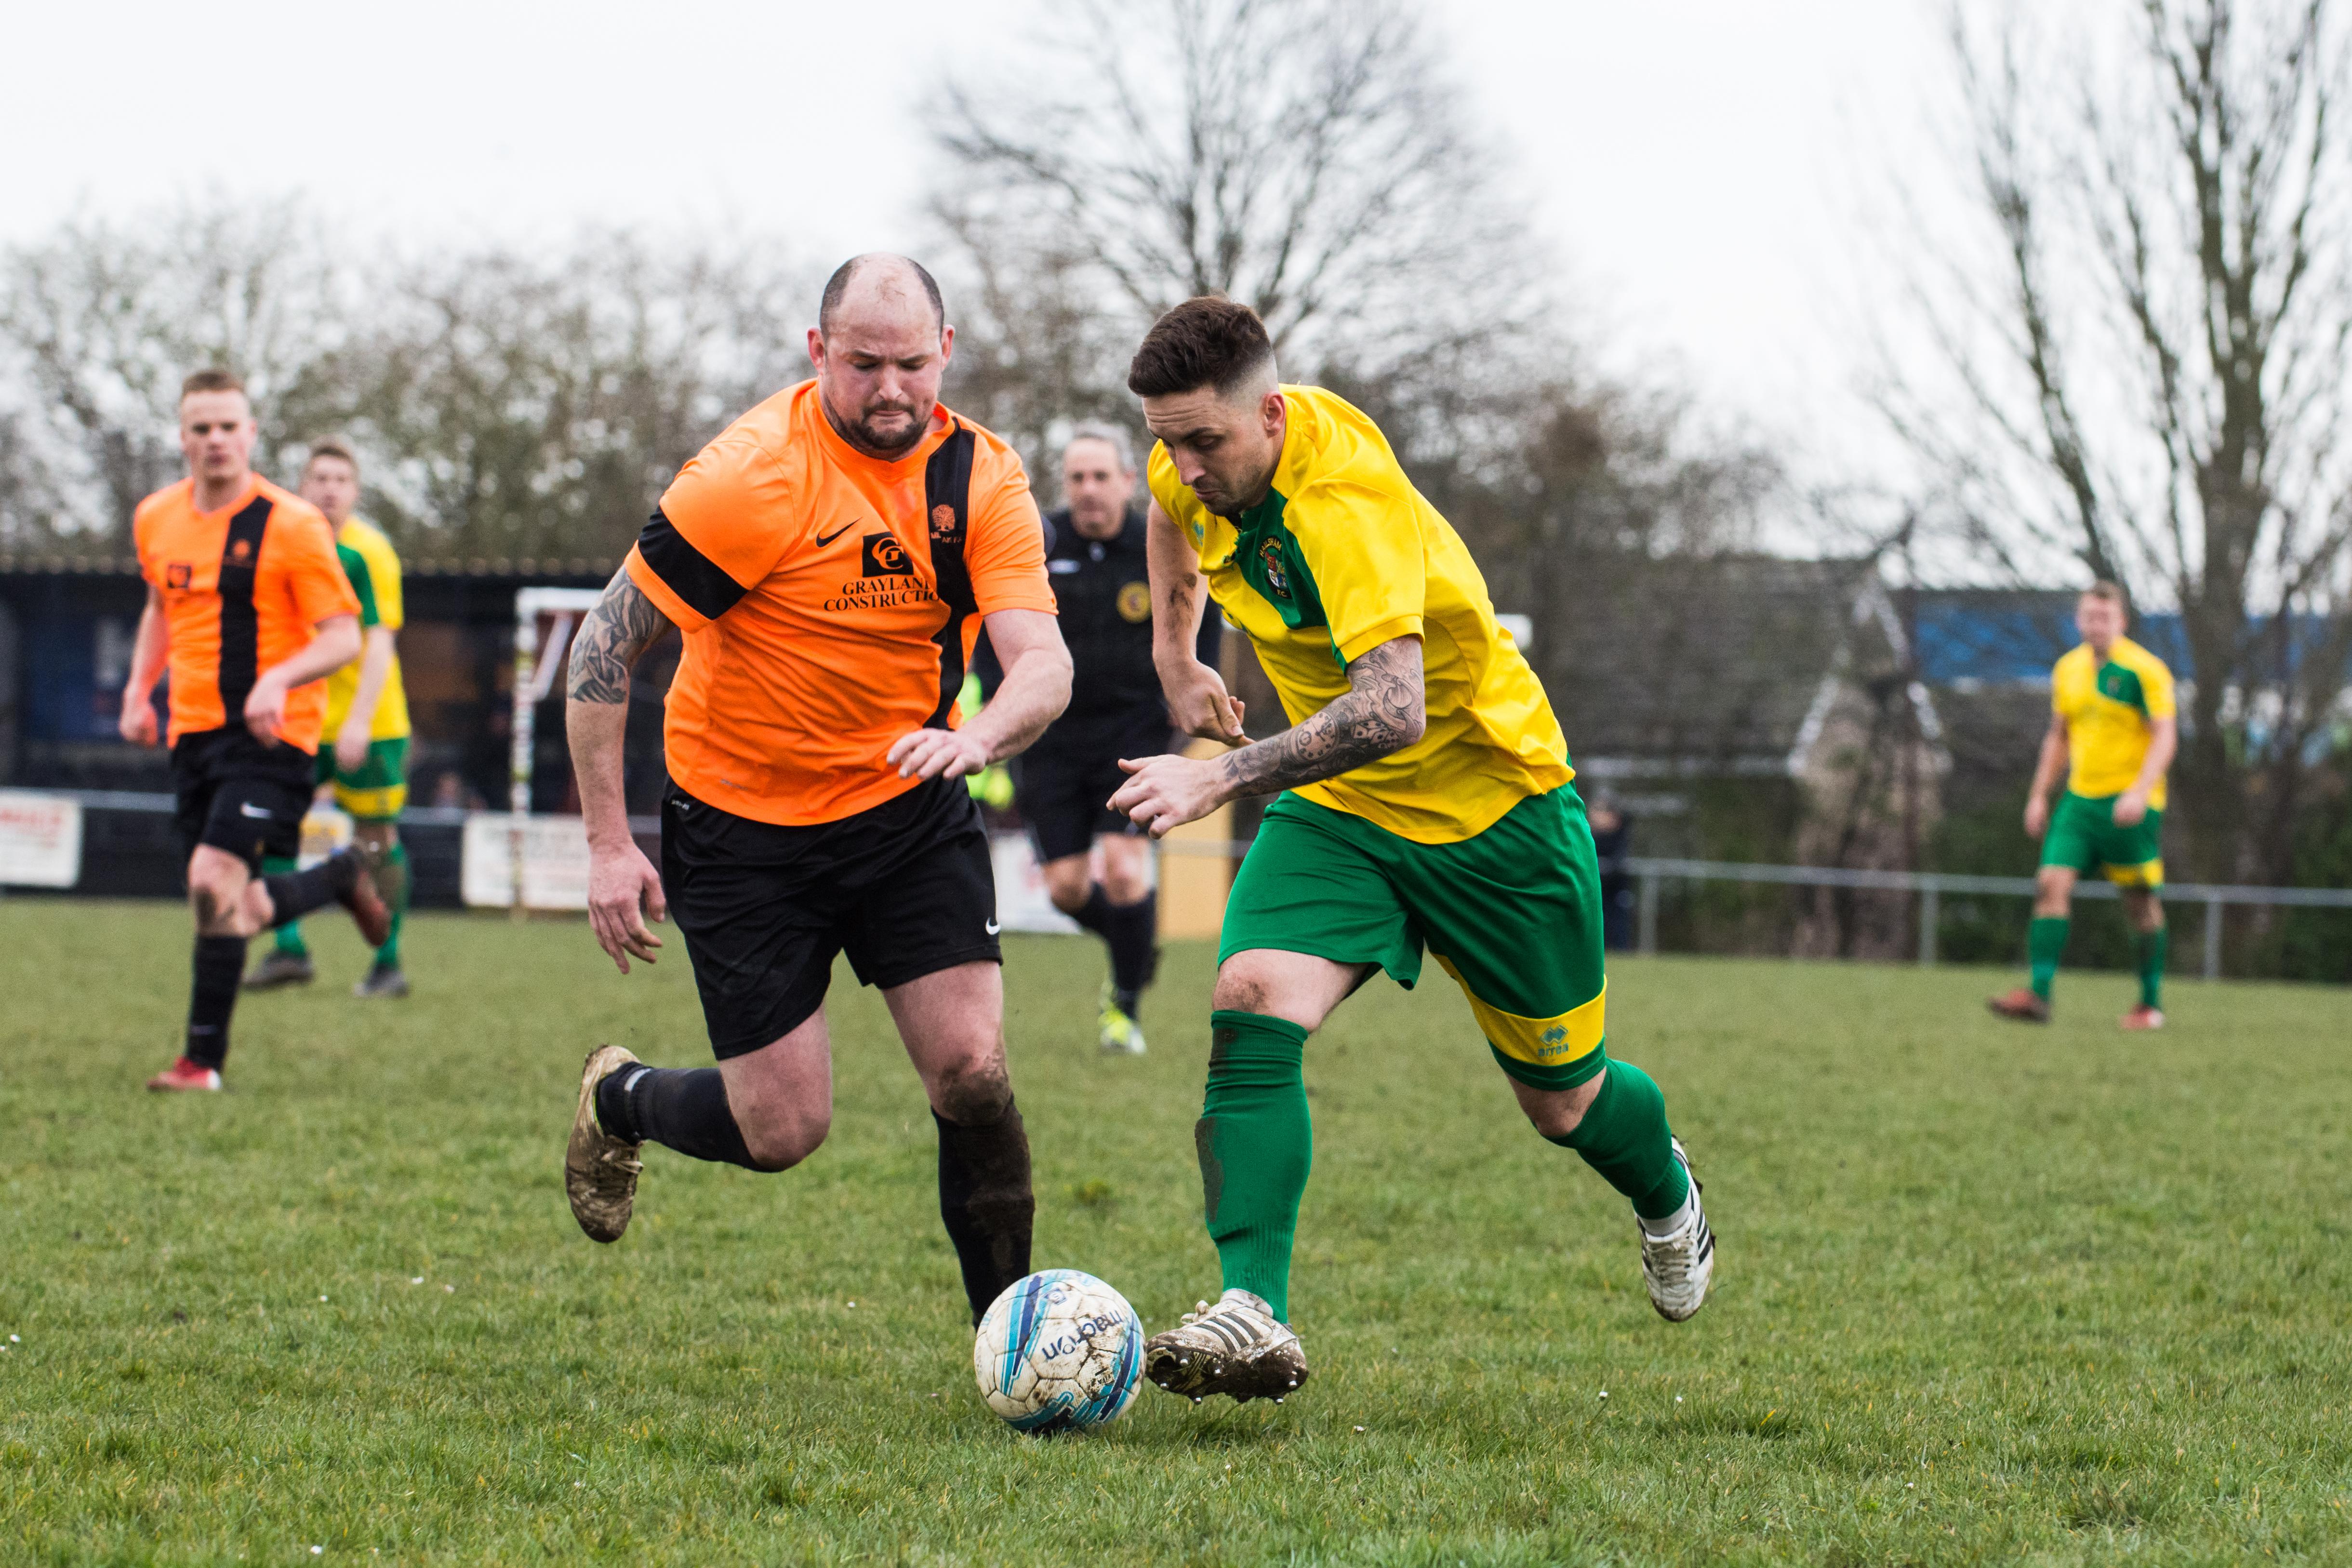 DAVID_JEFFERY Mile Oak FC vs Hailsham Town FC 24.03.18 82